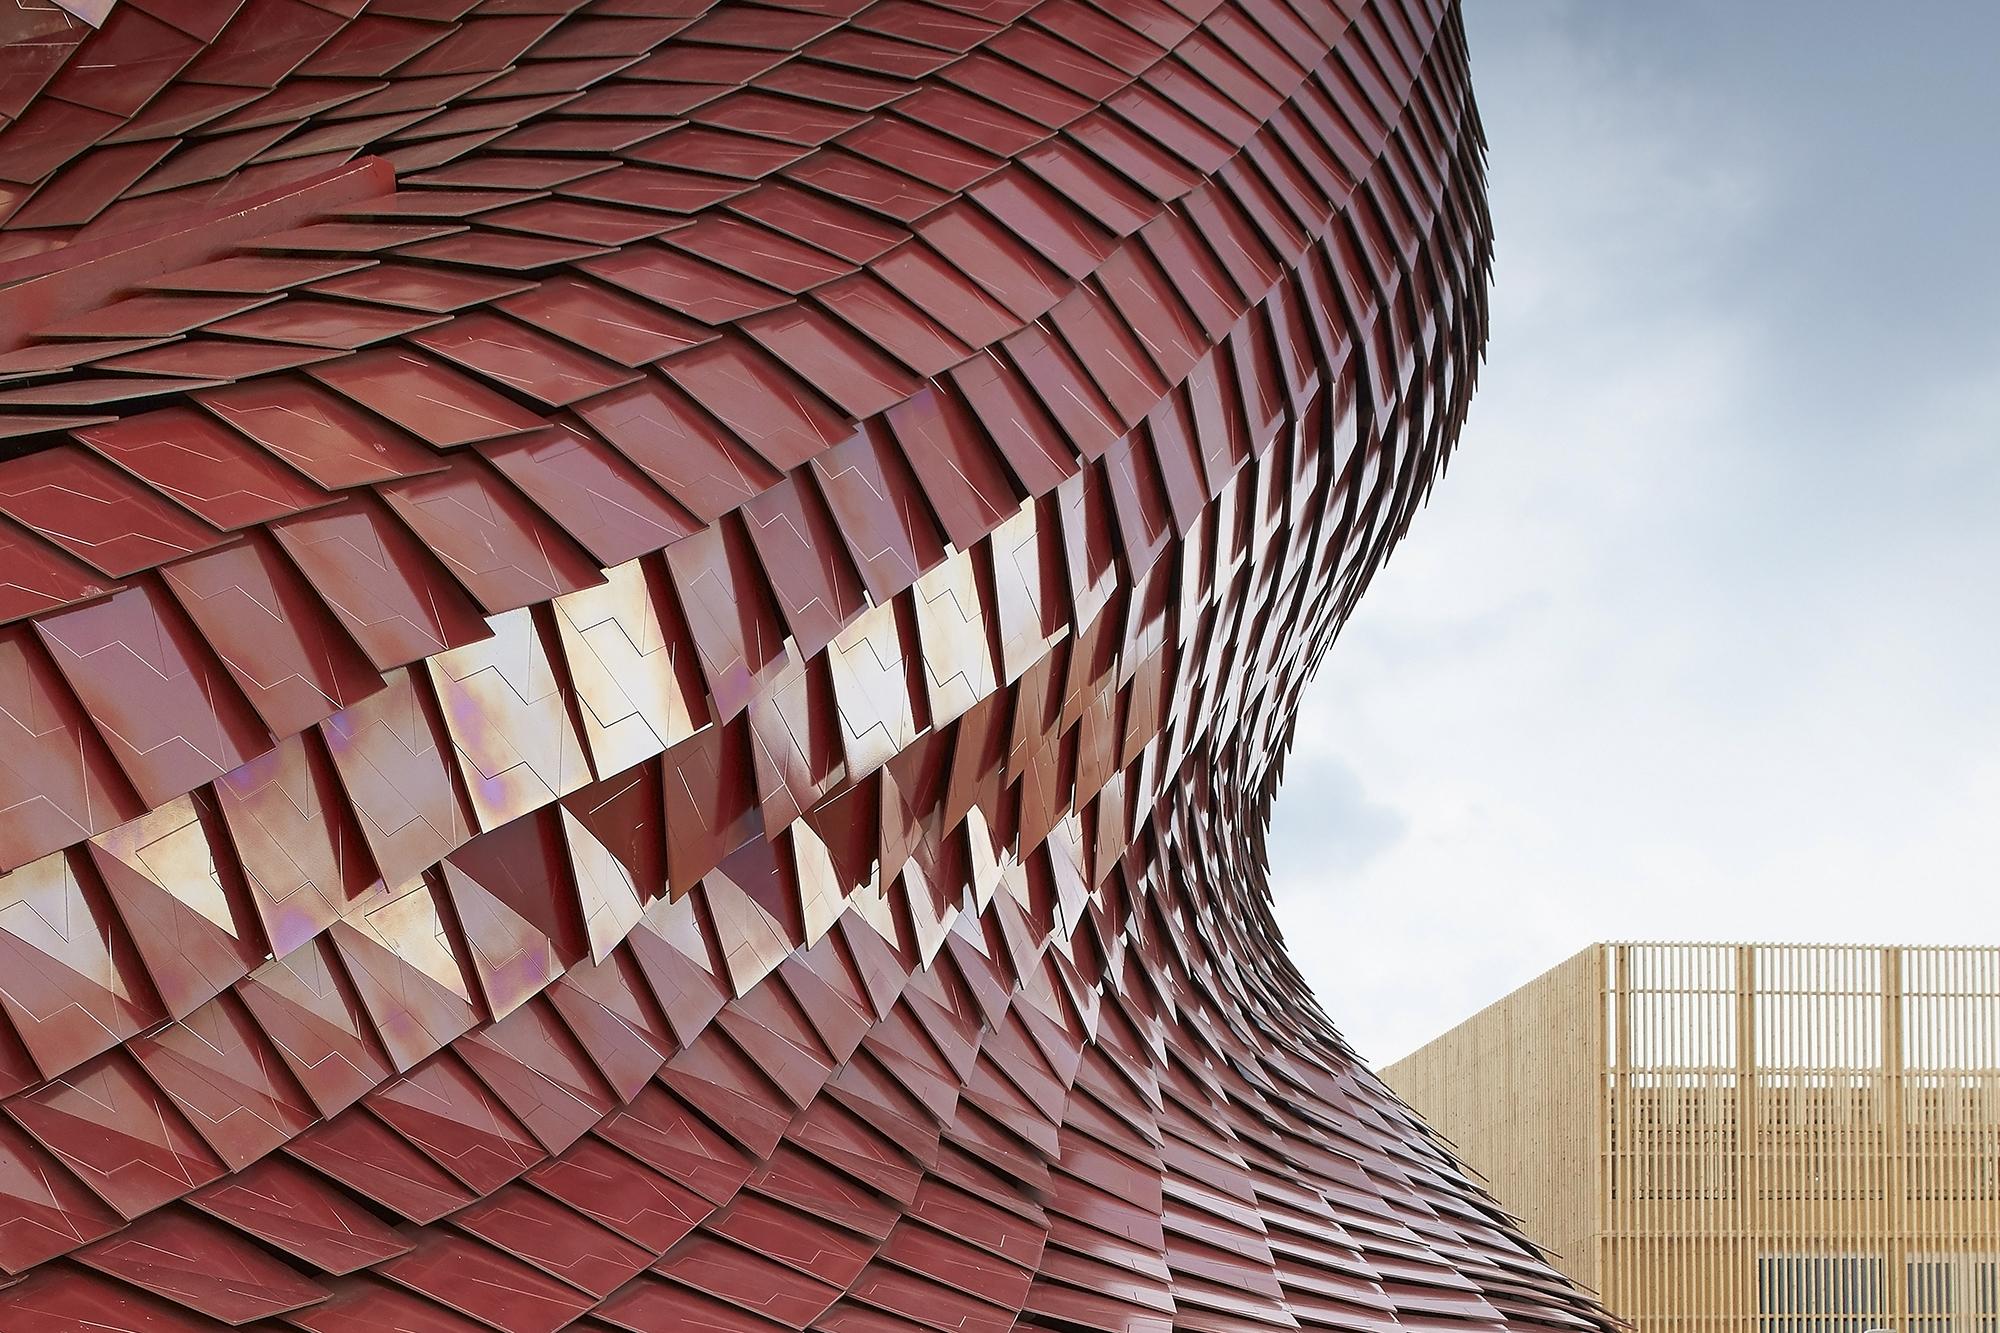 Detail The Tiles of Studio Libeskinds Vanke Pavilion